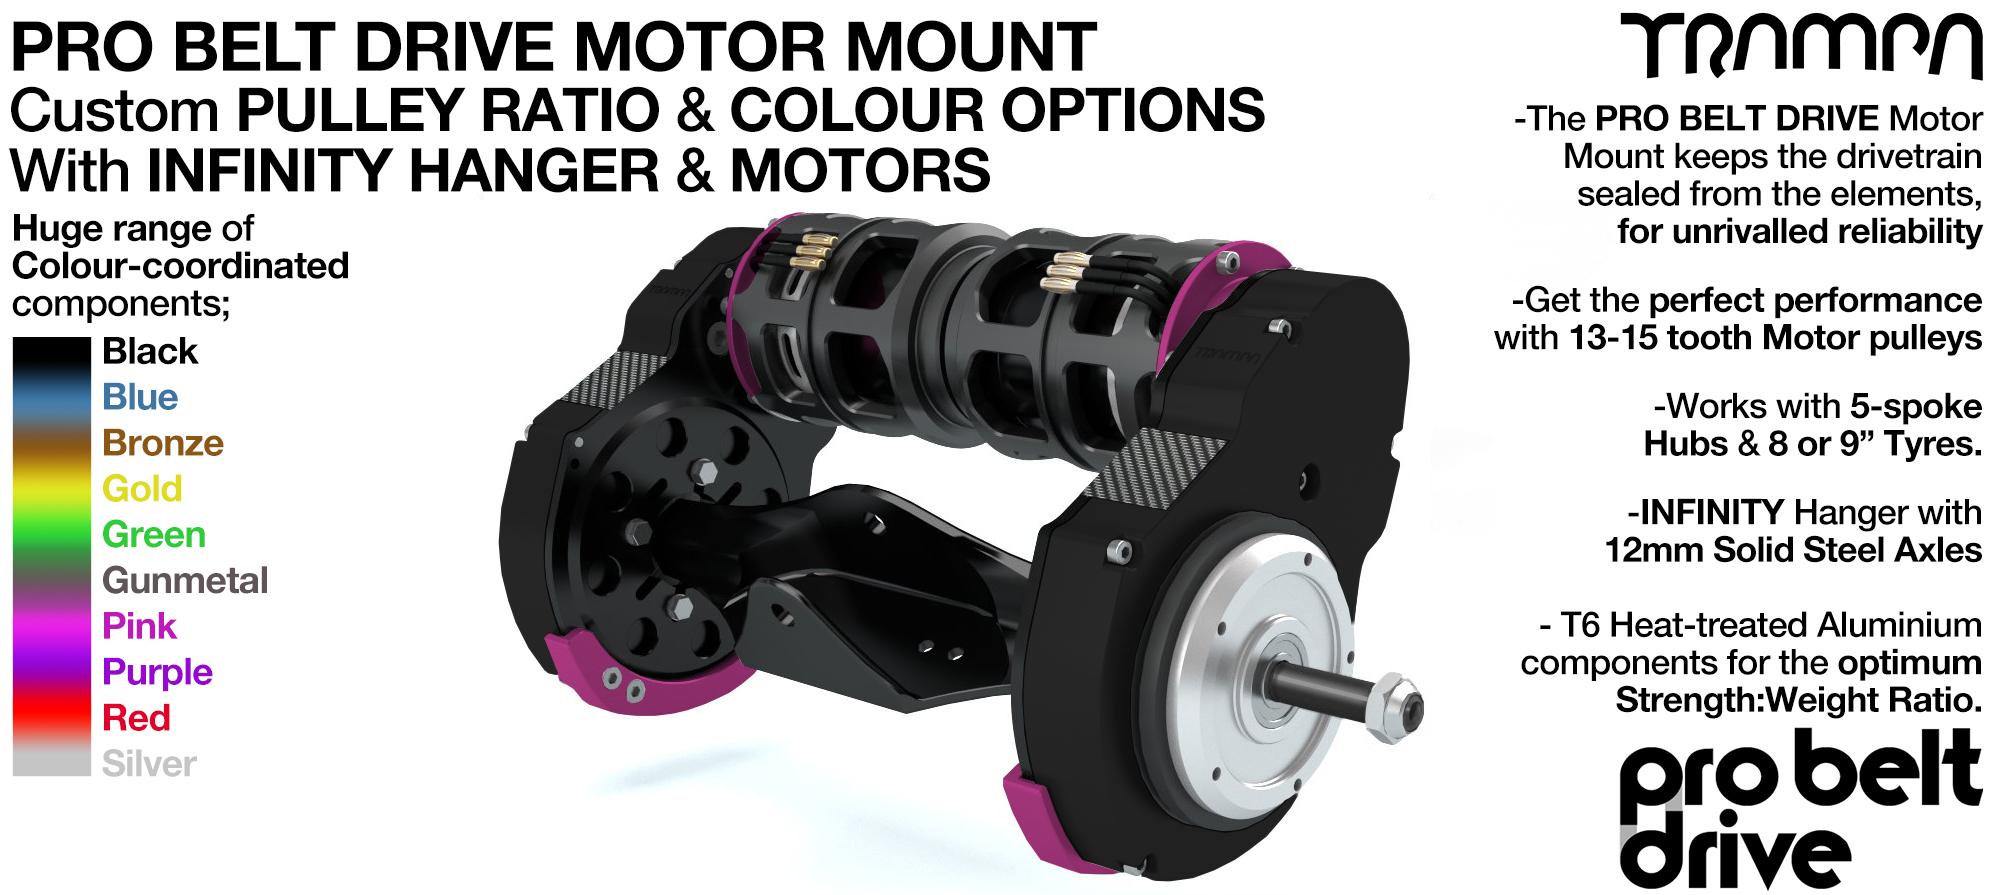 Mountainboard PRO Belt Drive TWIN Motor Mounts WITH Motors & Precision INFINITY Hanger